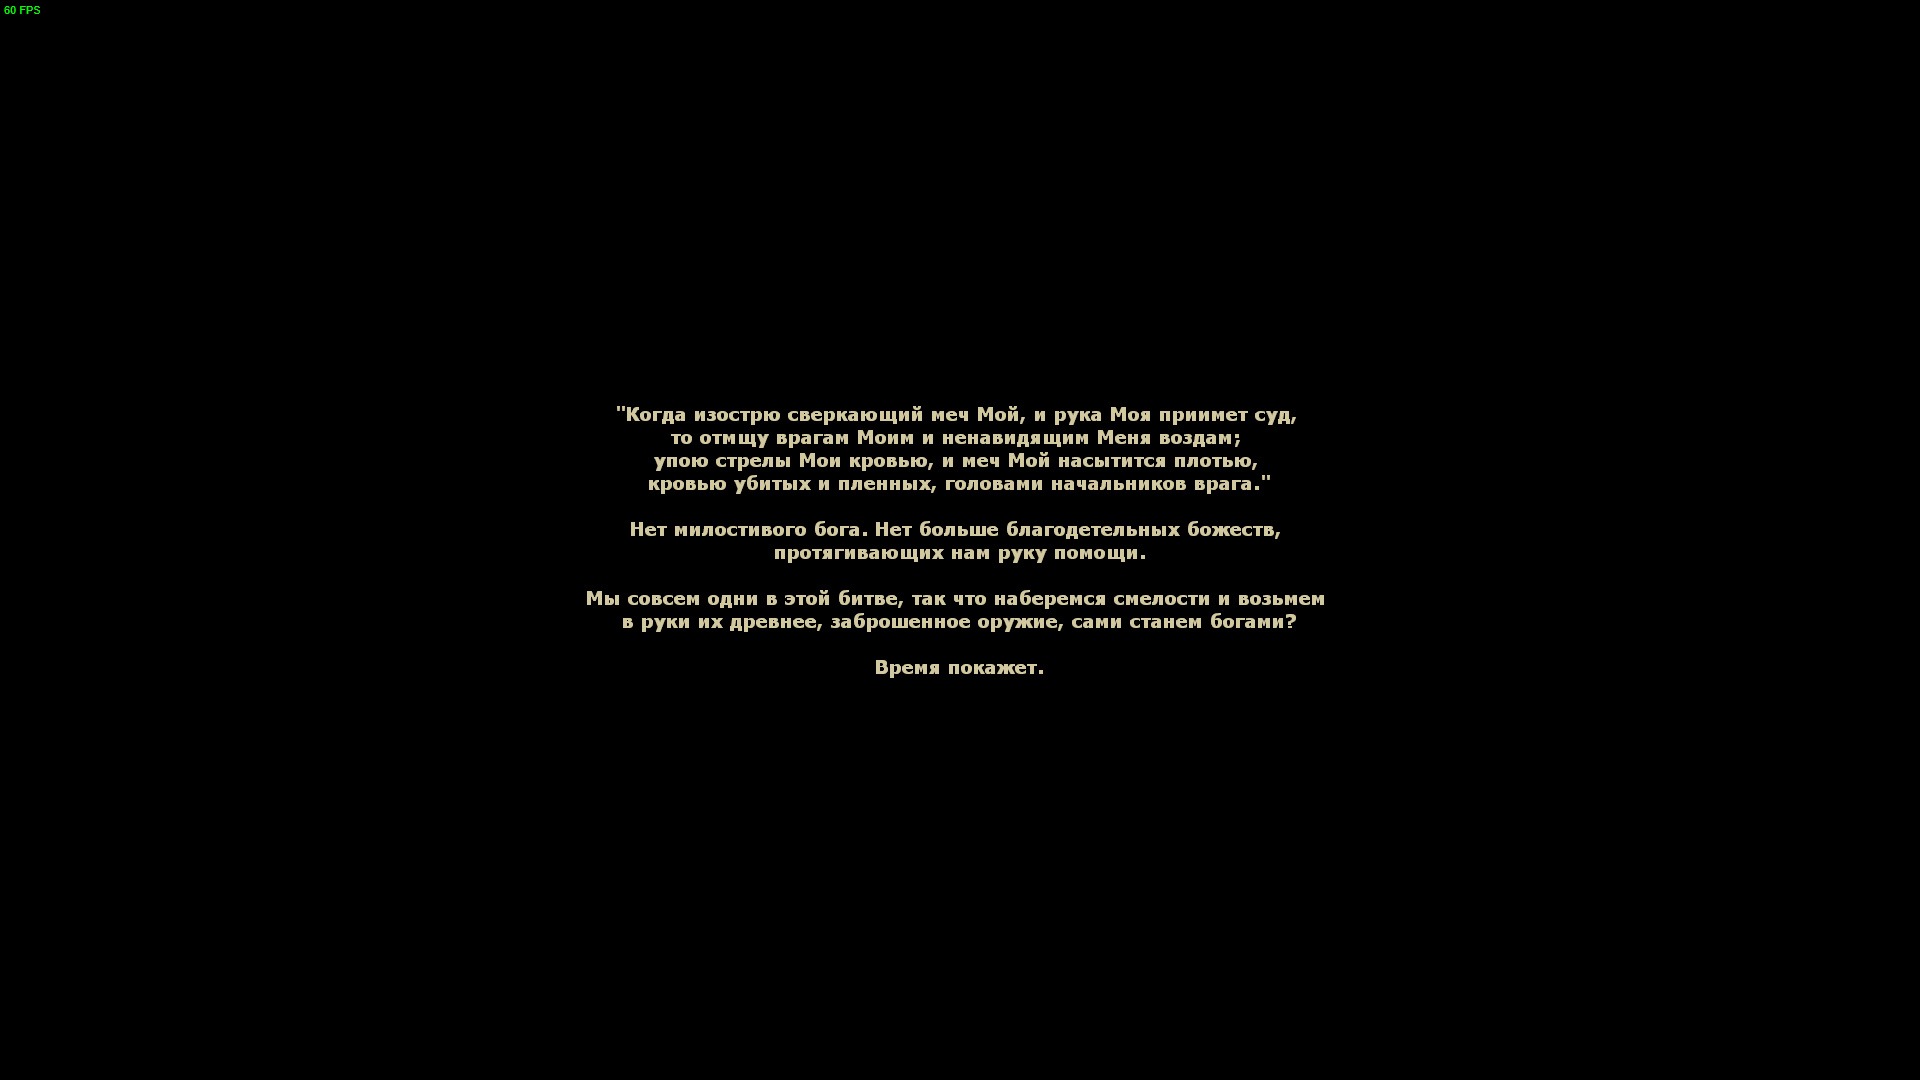 hl2 2017-11-22 21-33-05-316.jpg - Half-Life 2